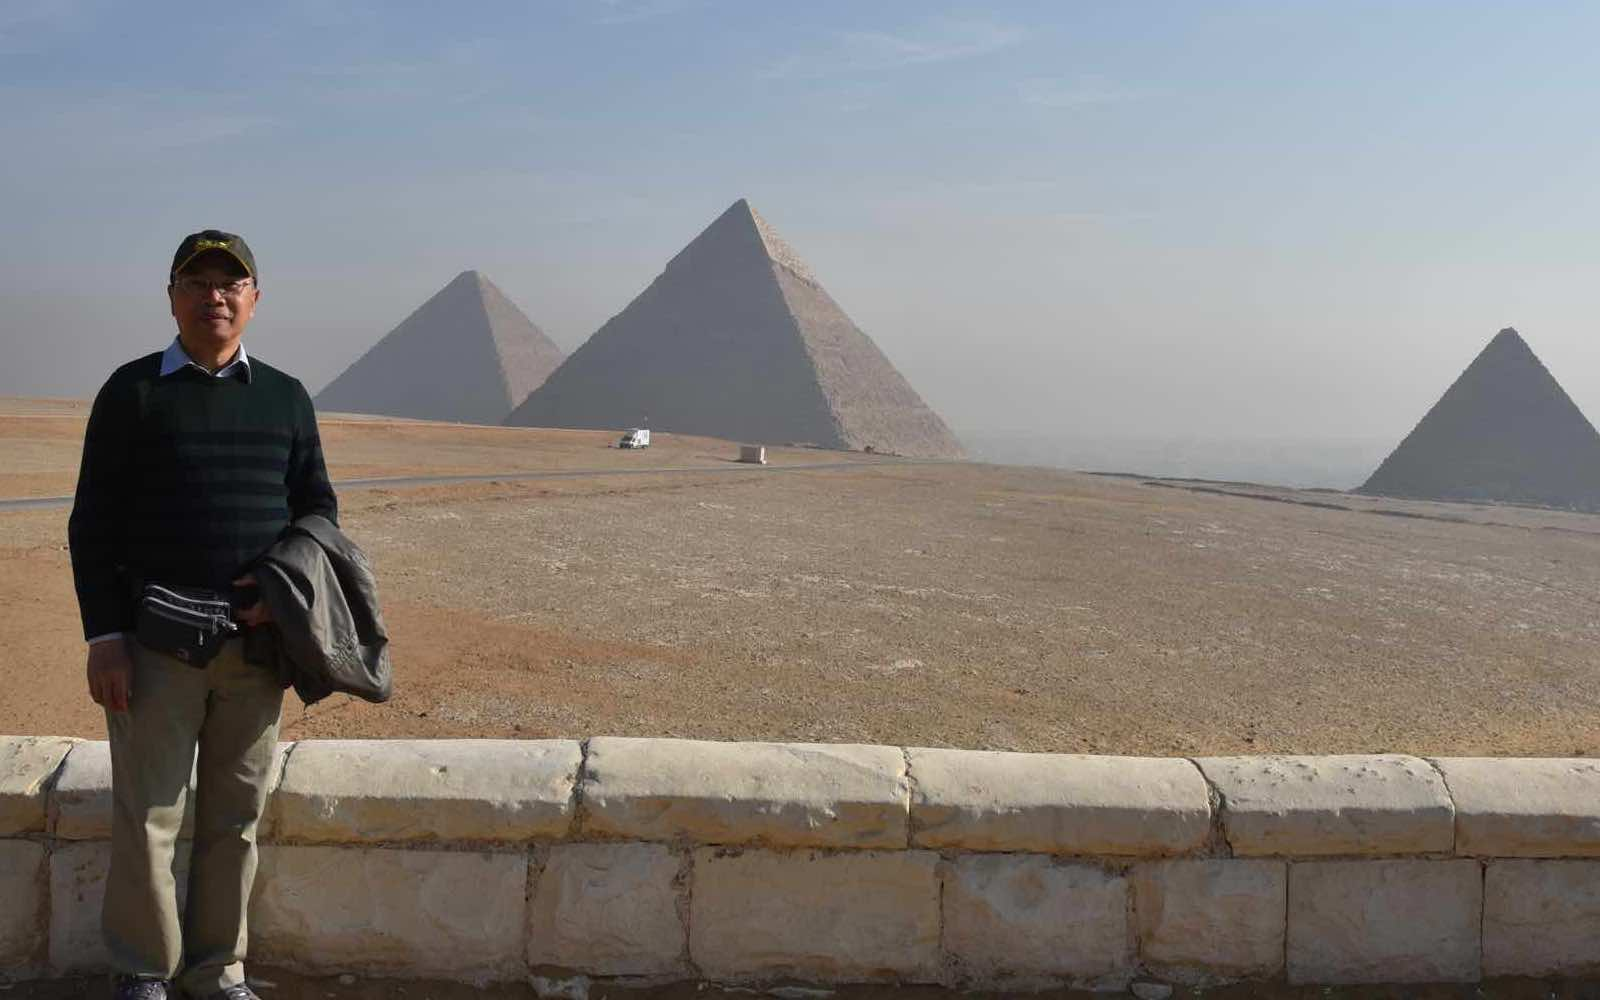 Cairo; Pyramids, Sphinx and screaming Chinese